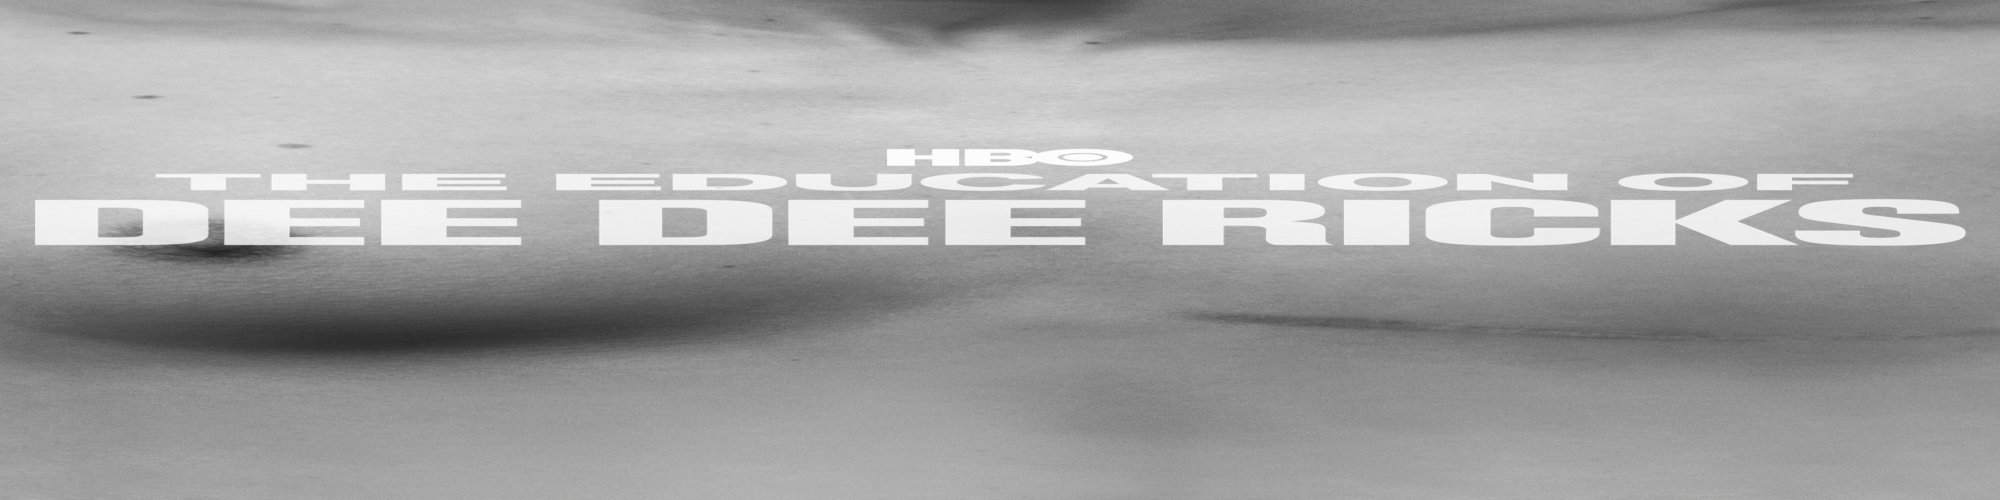 The Education of Dee Dee Ricks